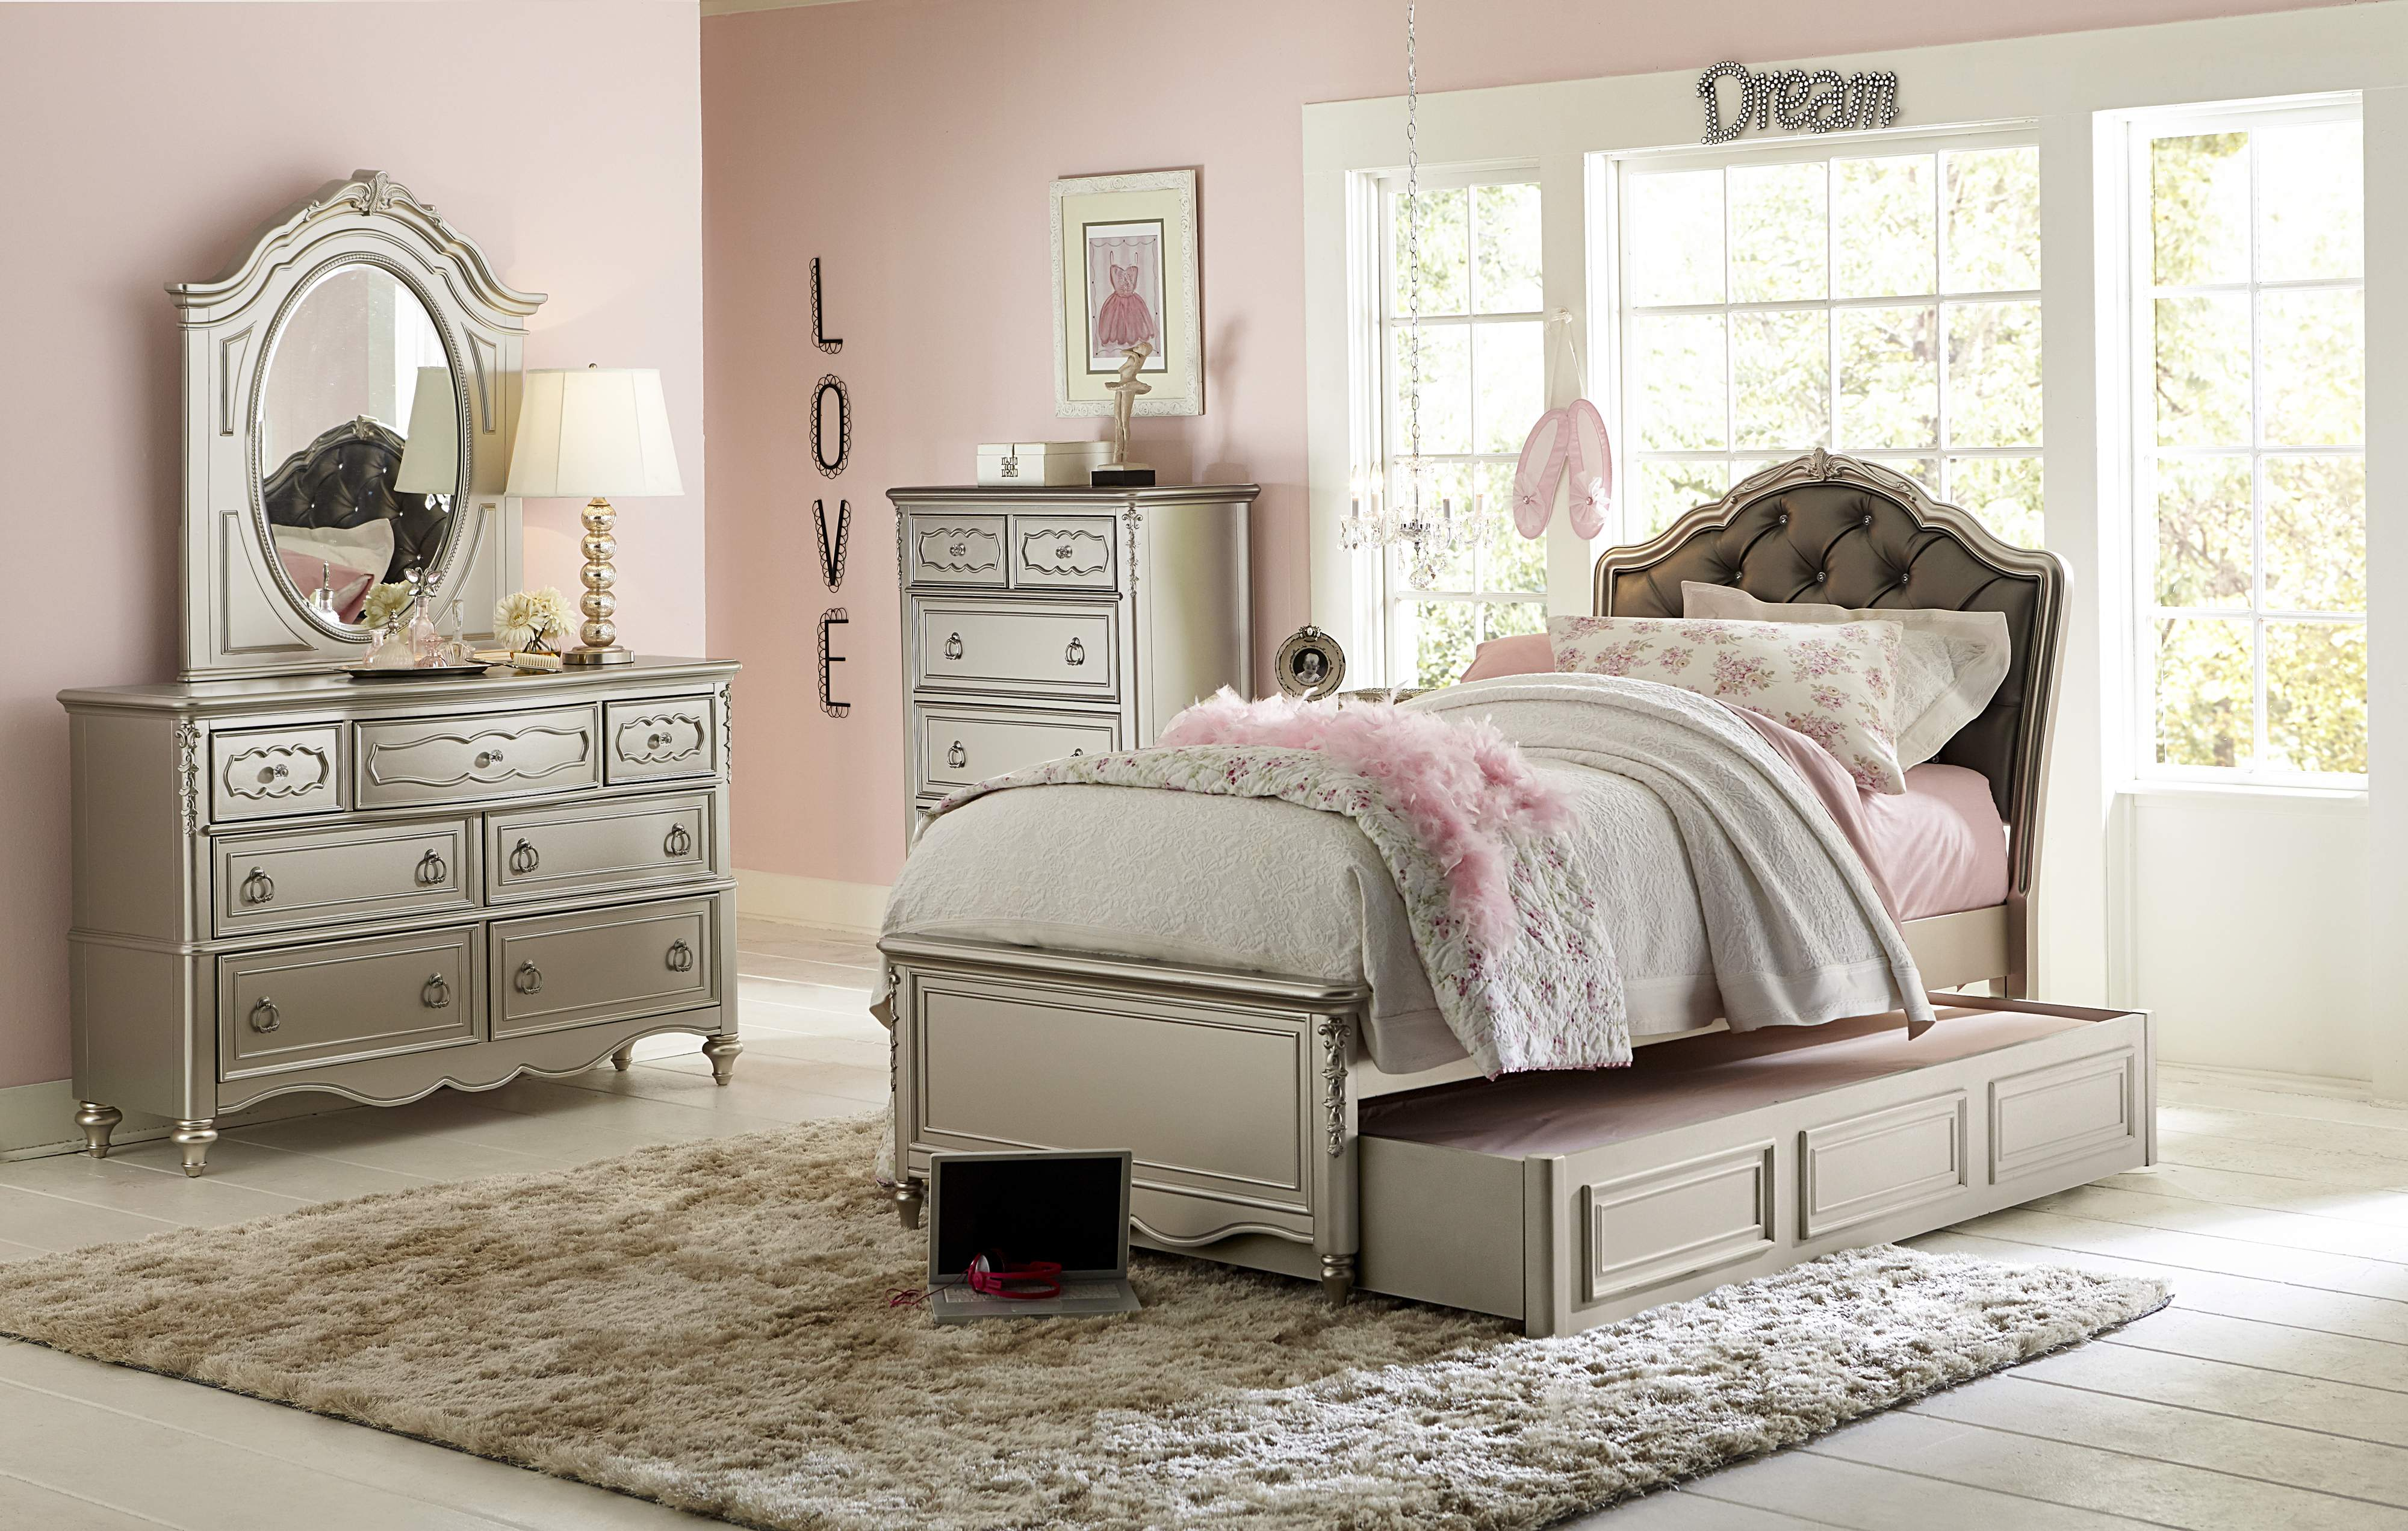 Girls Bedroom Furniture Set by Samuel Lawrence in Long ...